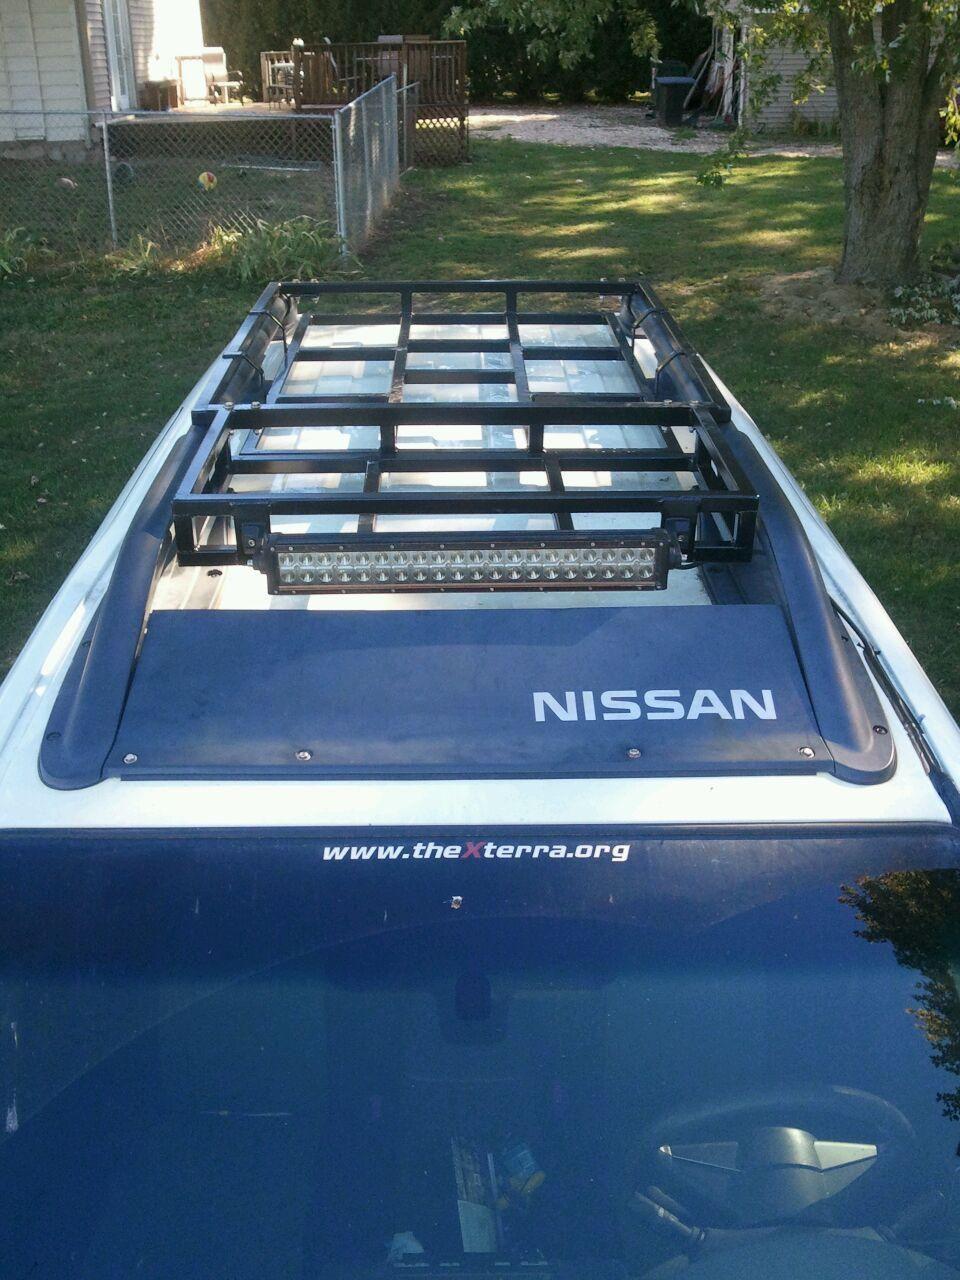 Pin By Cody Johnson On Great Ideas Nissan Xterra Nissan Nissan Frontier